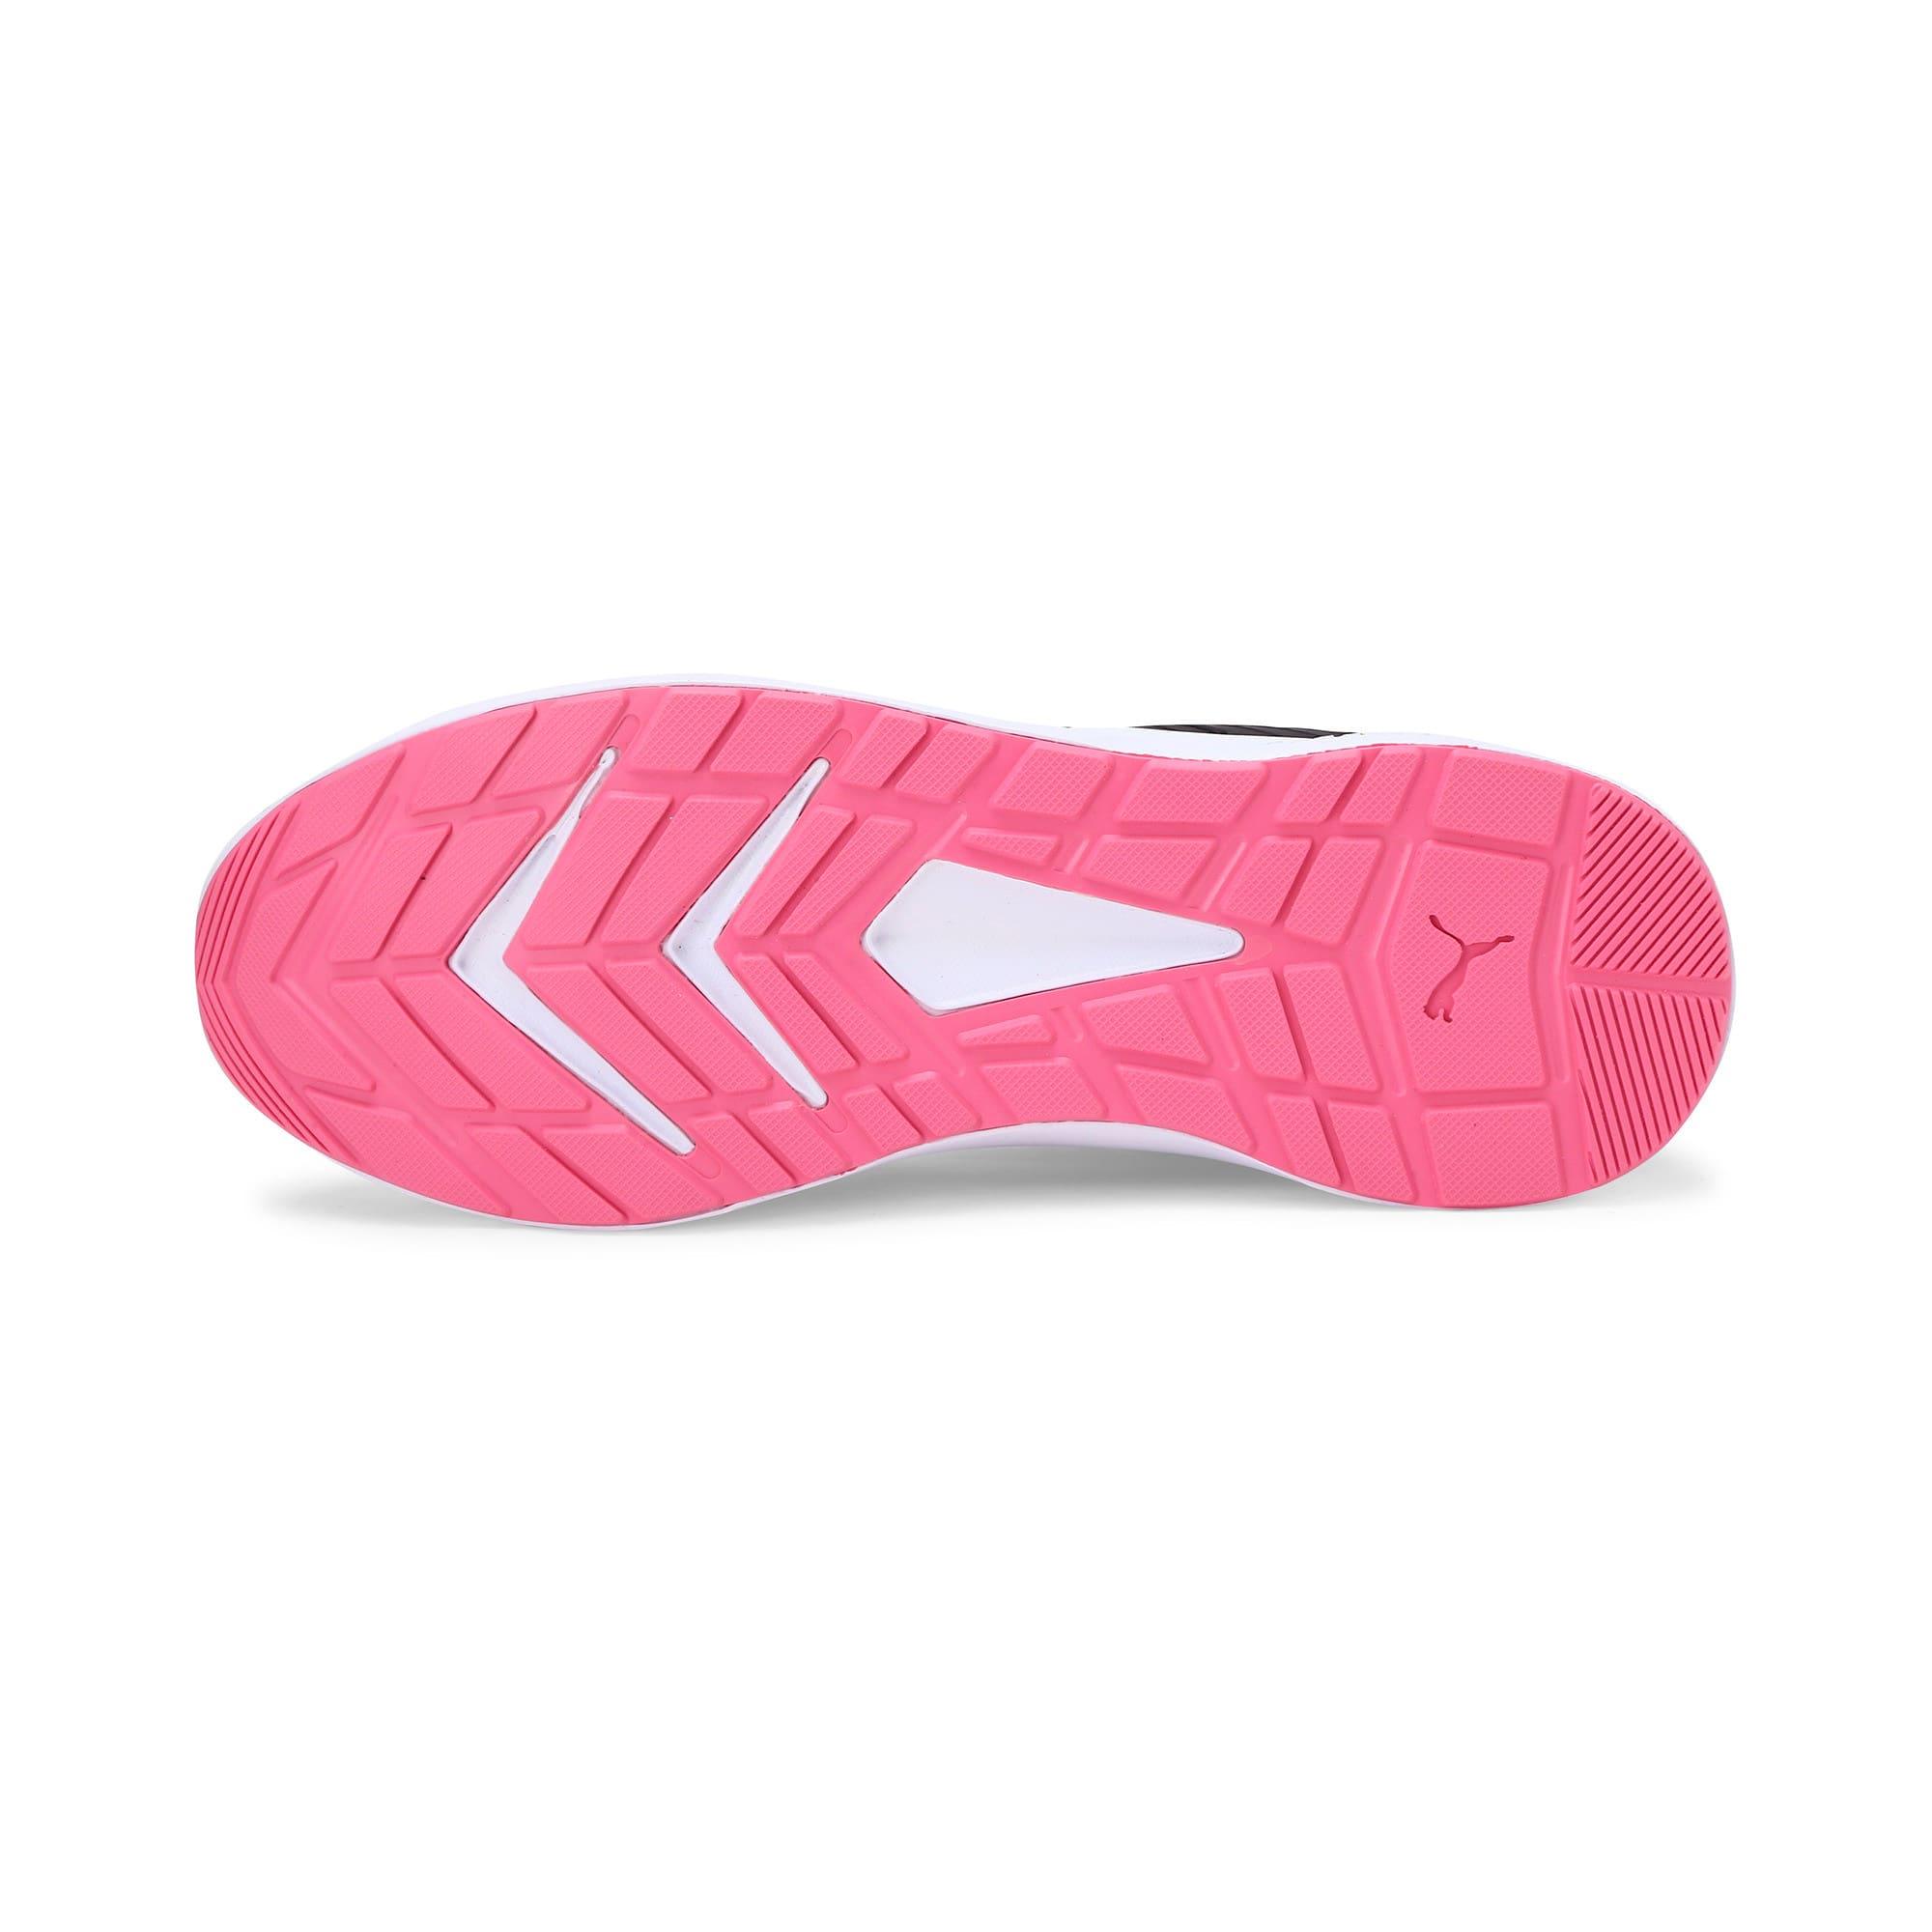 Thumbnail 6 of Escaper Training Shoes, Puma Black-Azalea Pink-White, medium-IND